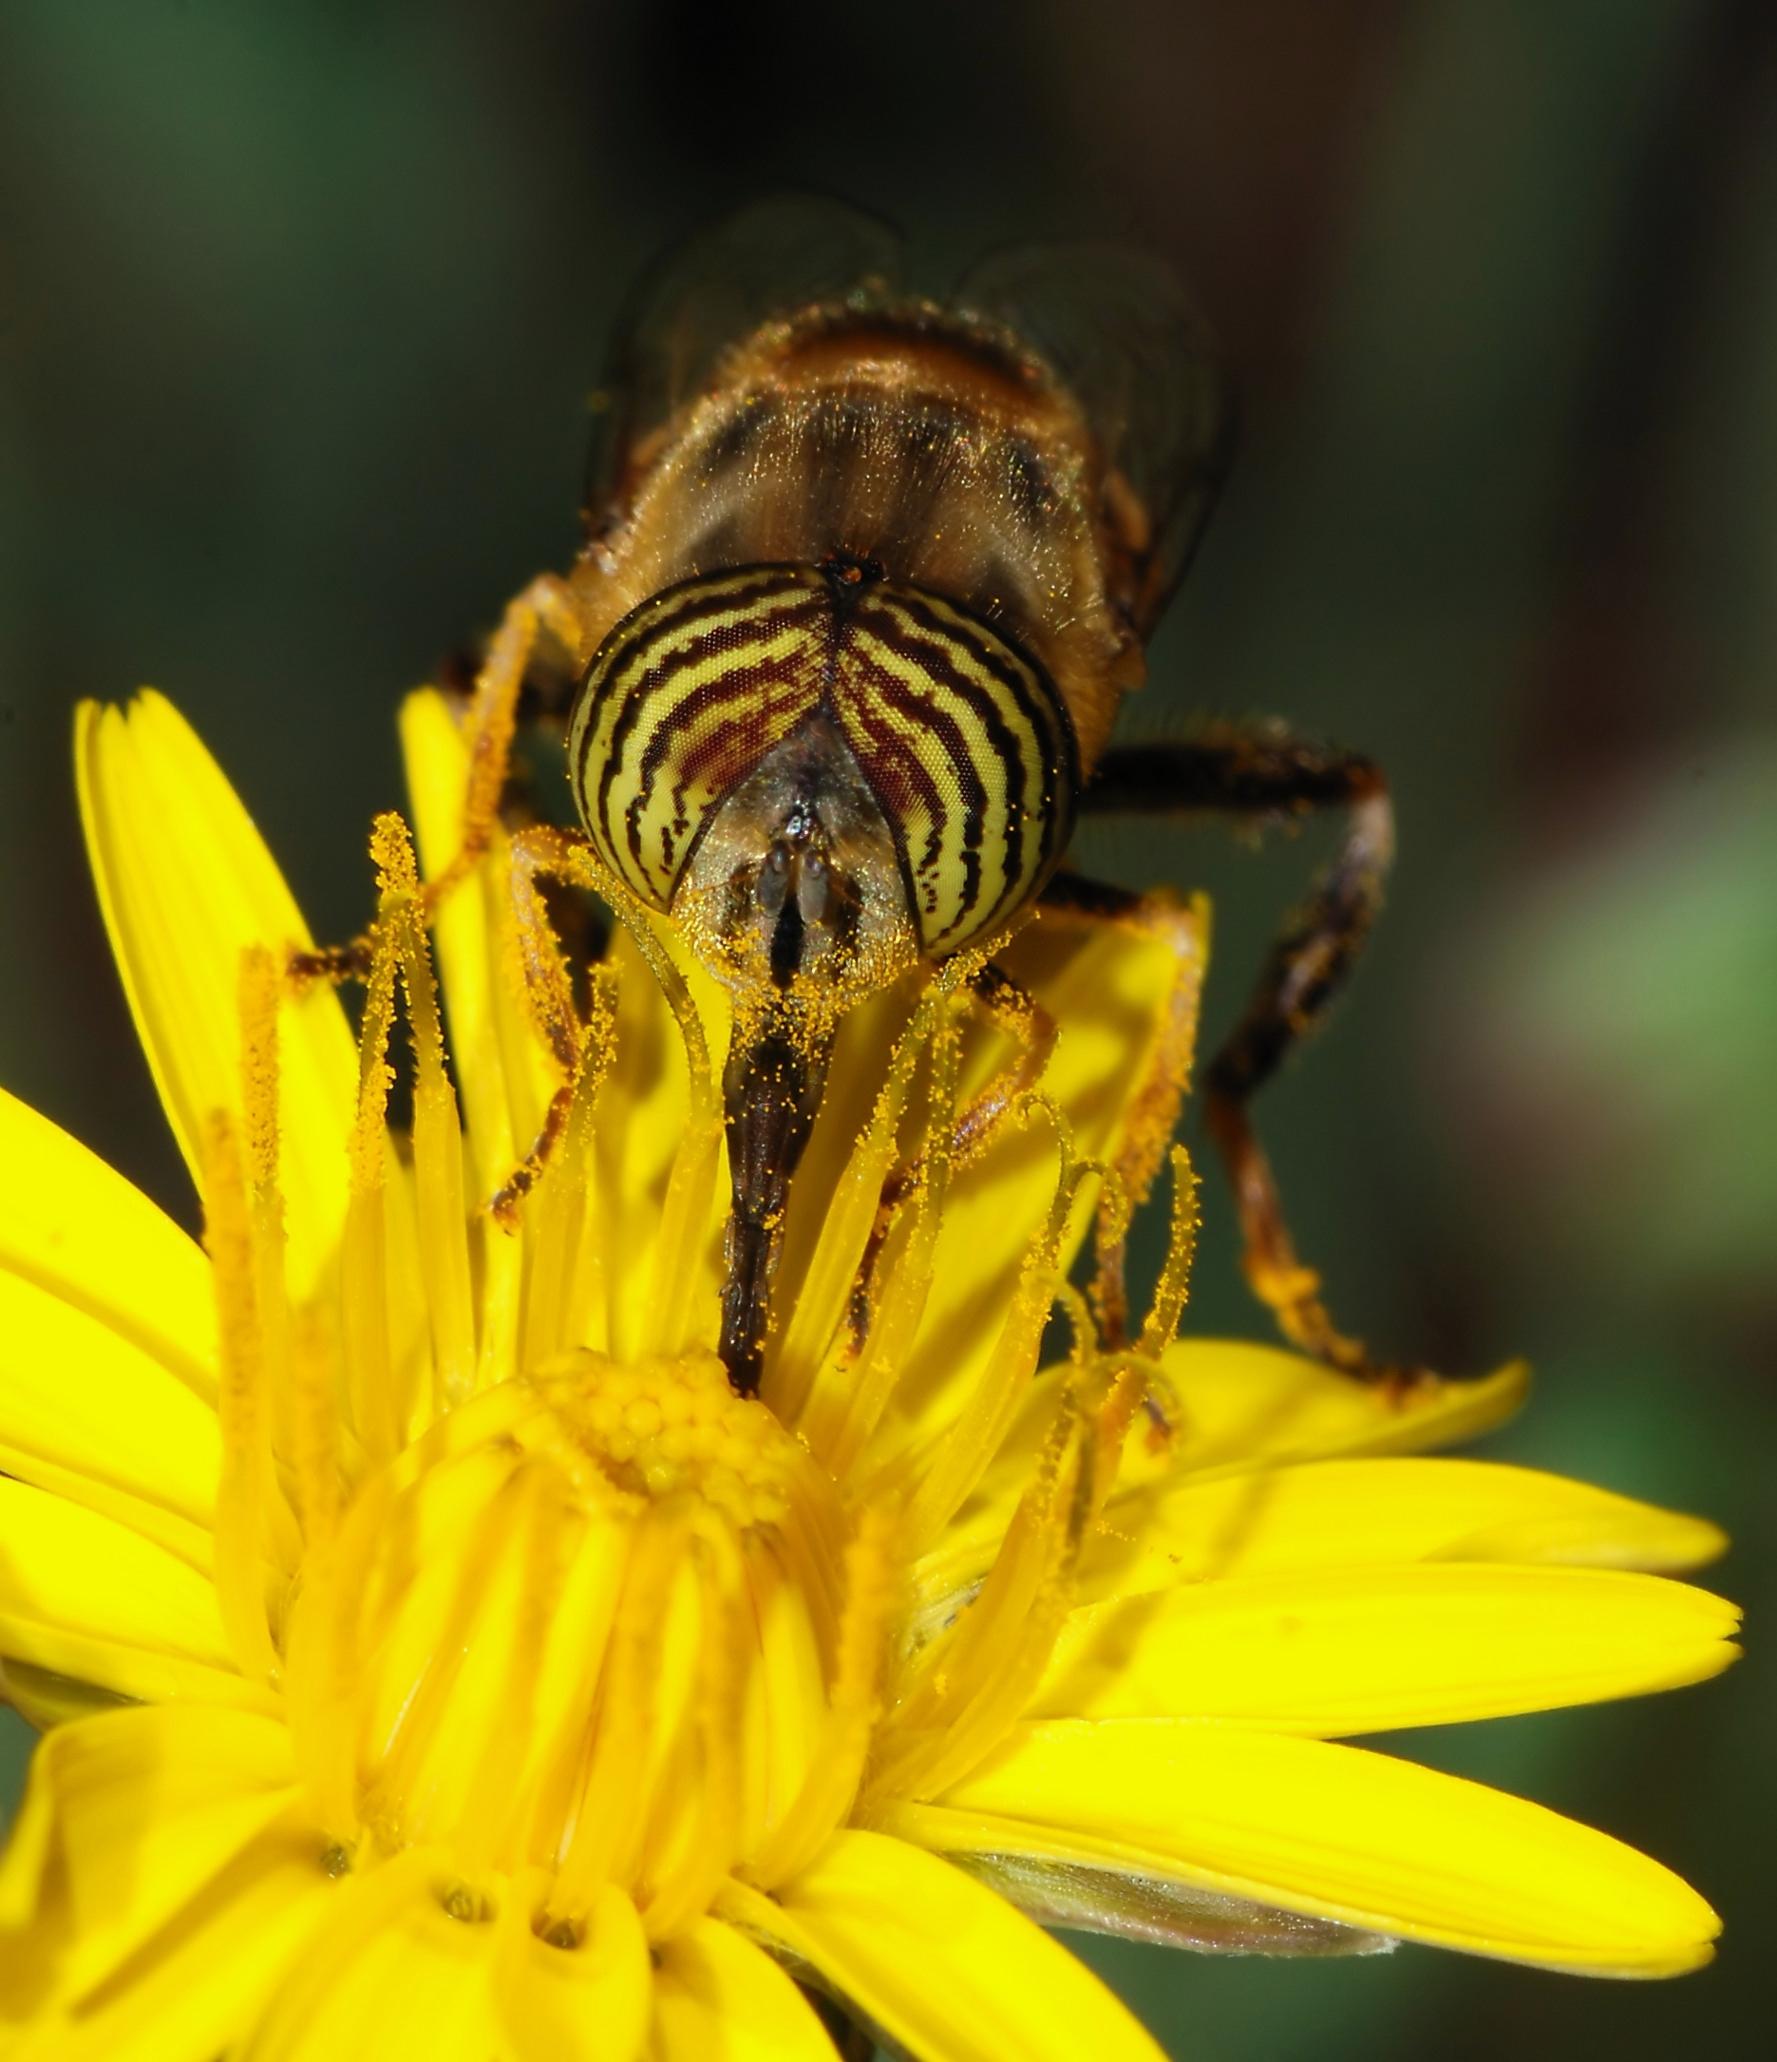 Pollinator - Wikipedia